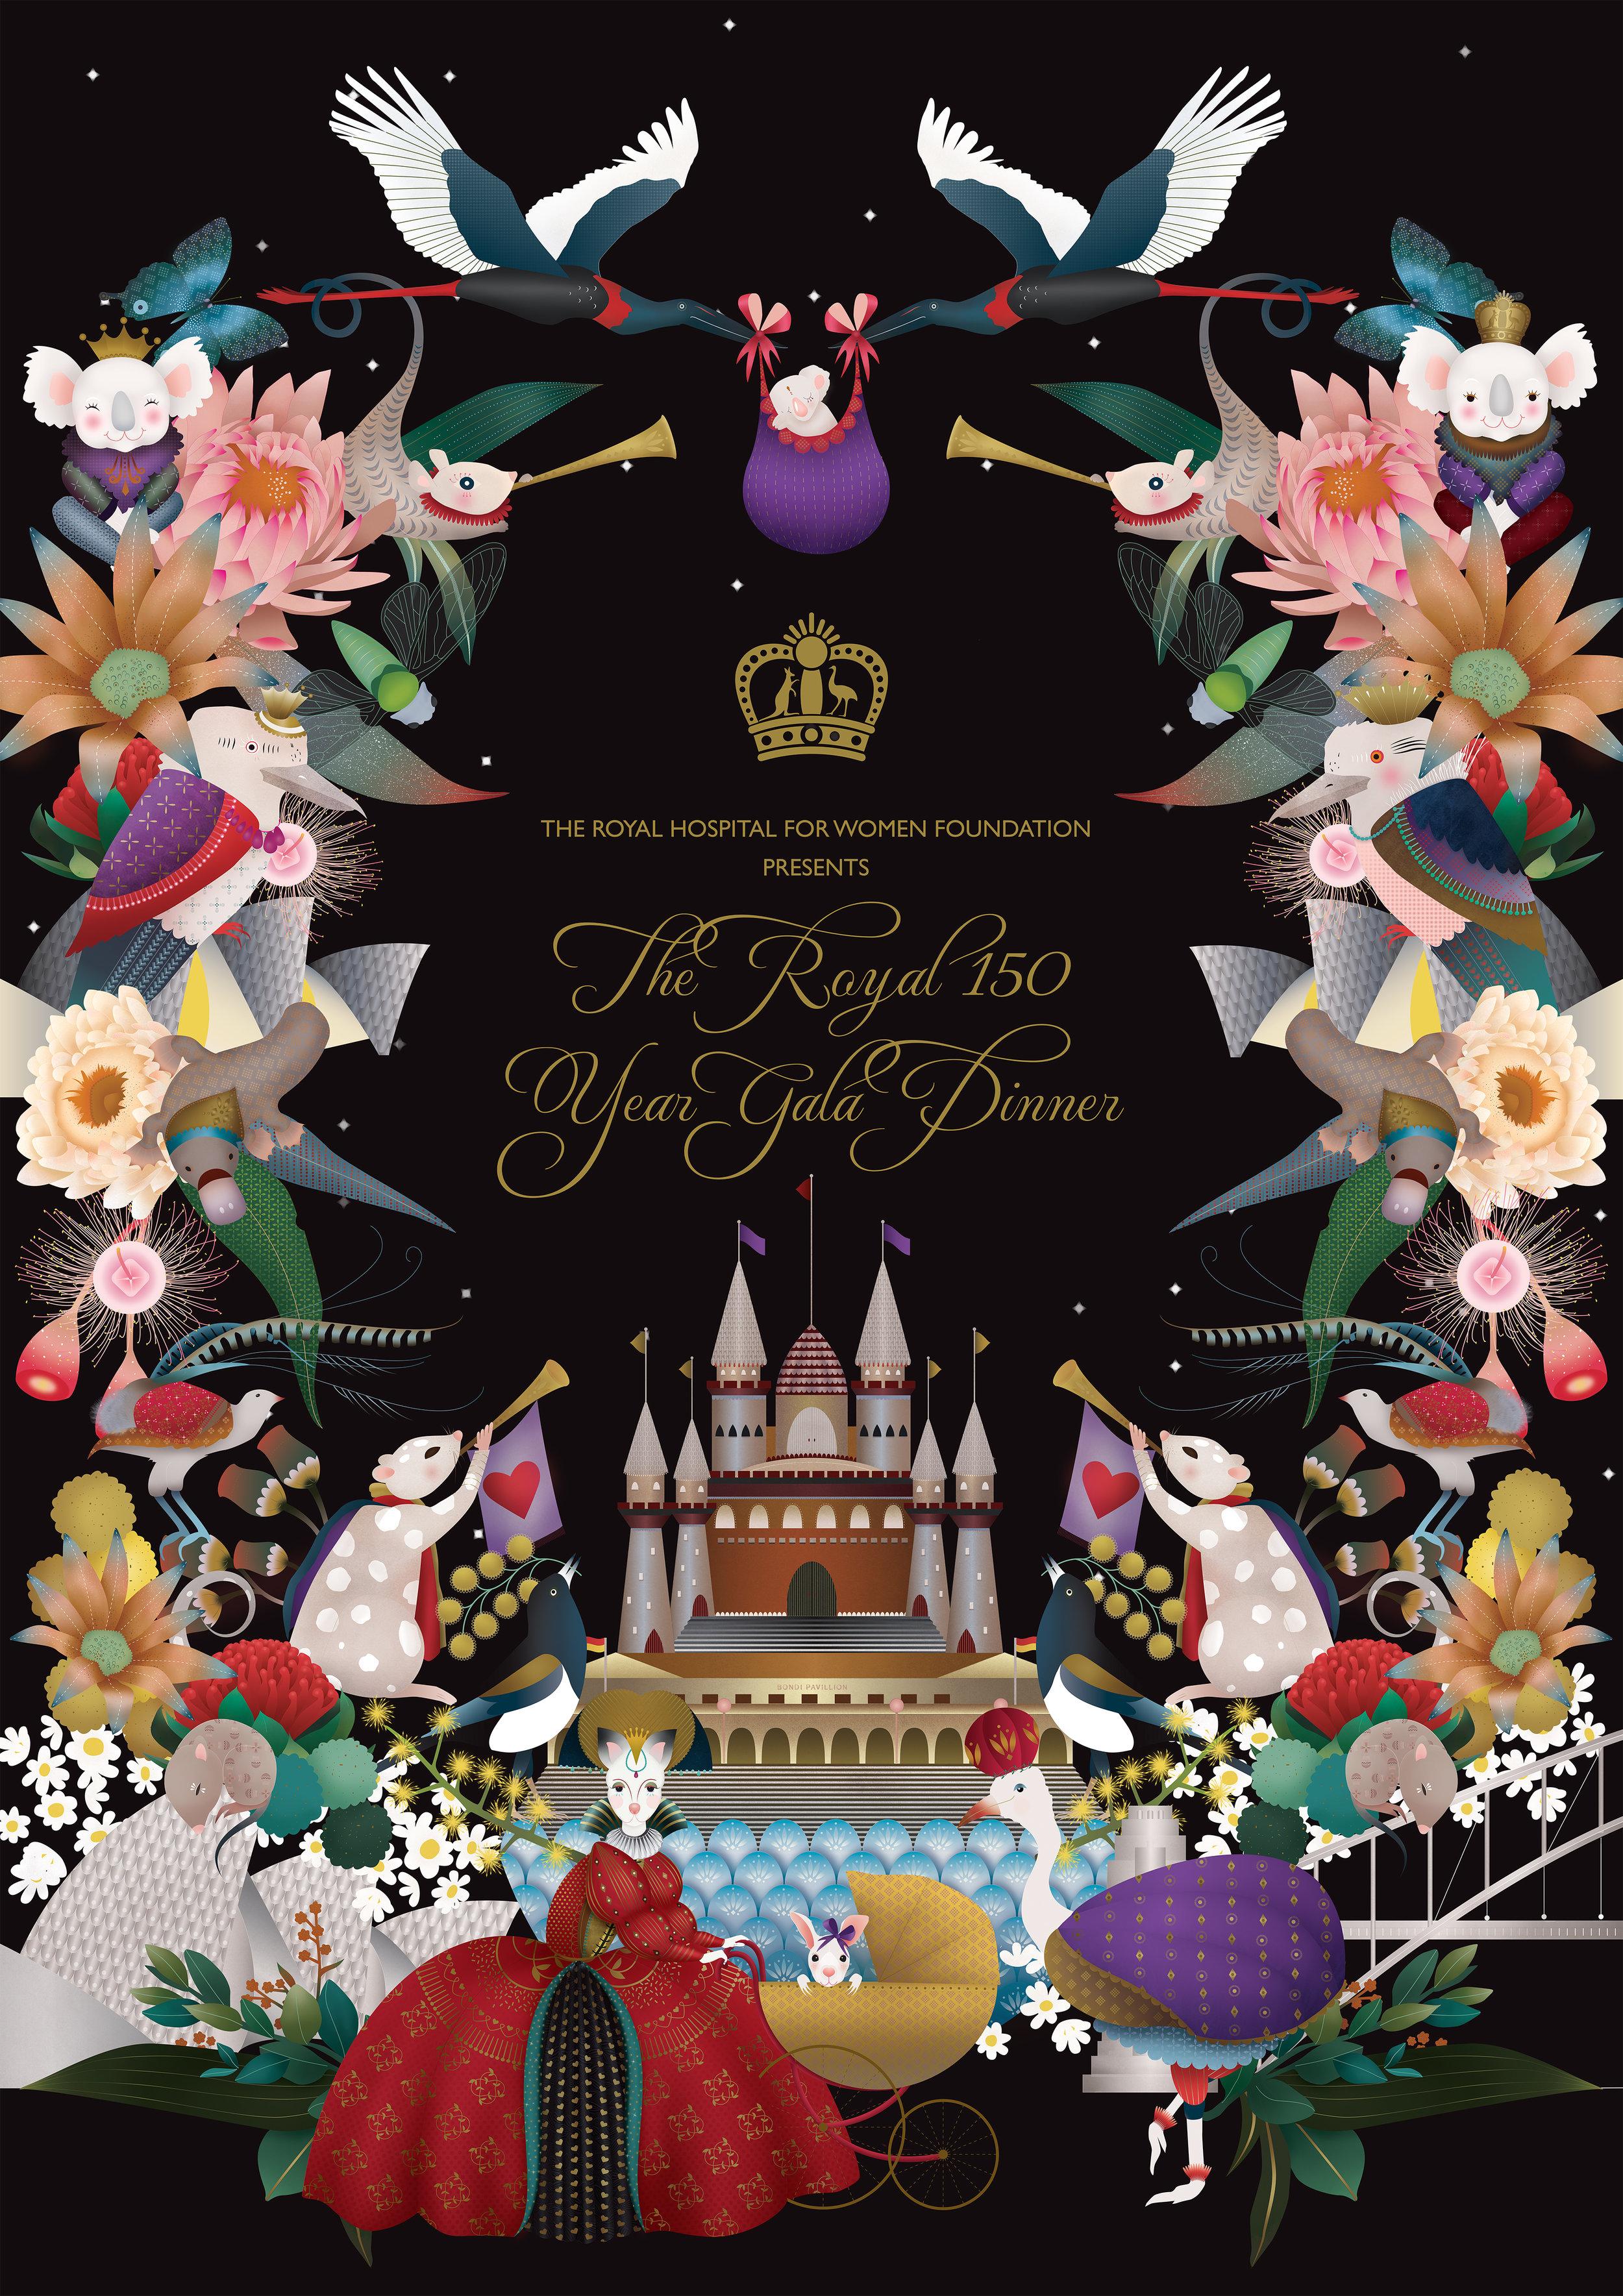 The Royal Hospital for Women Foundation by Nikki Johnstone